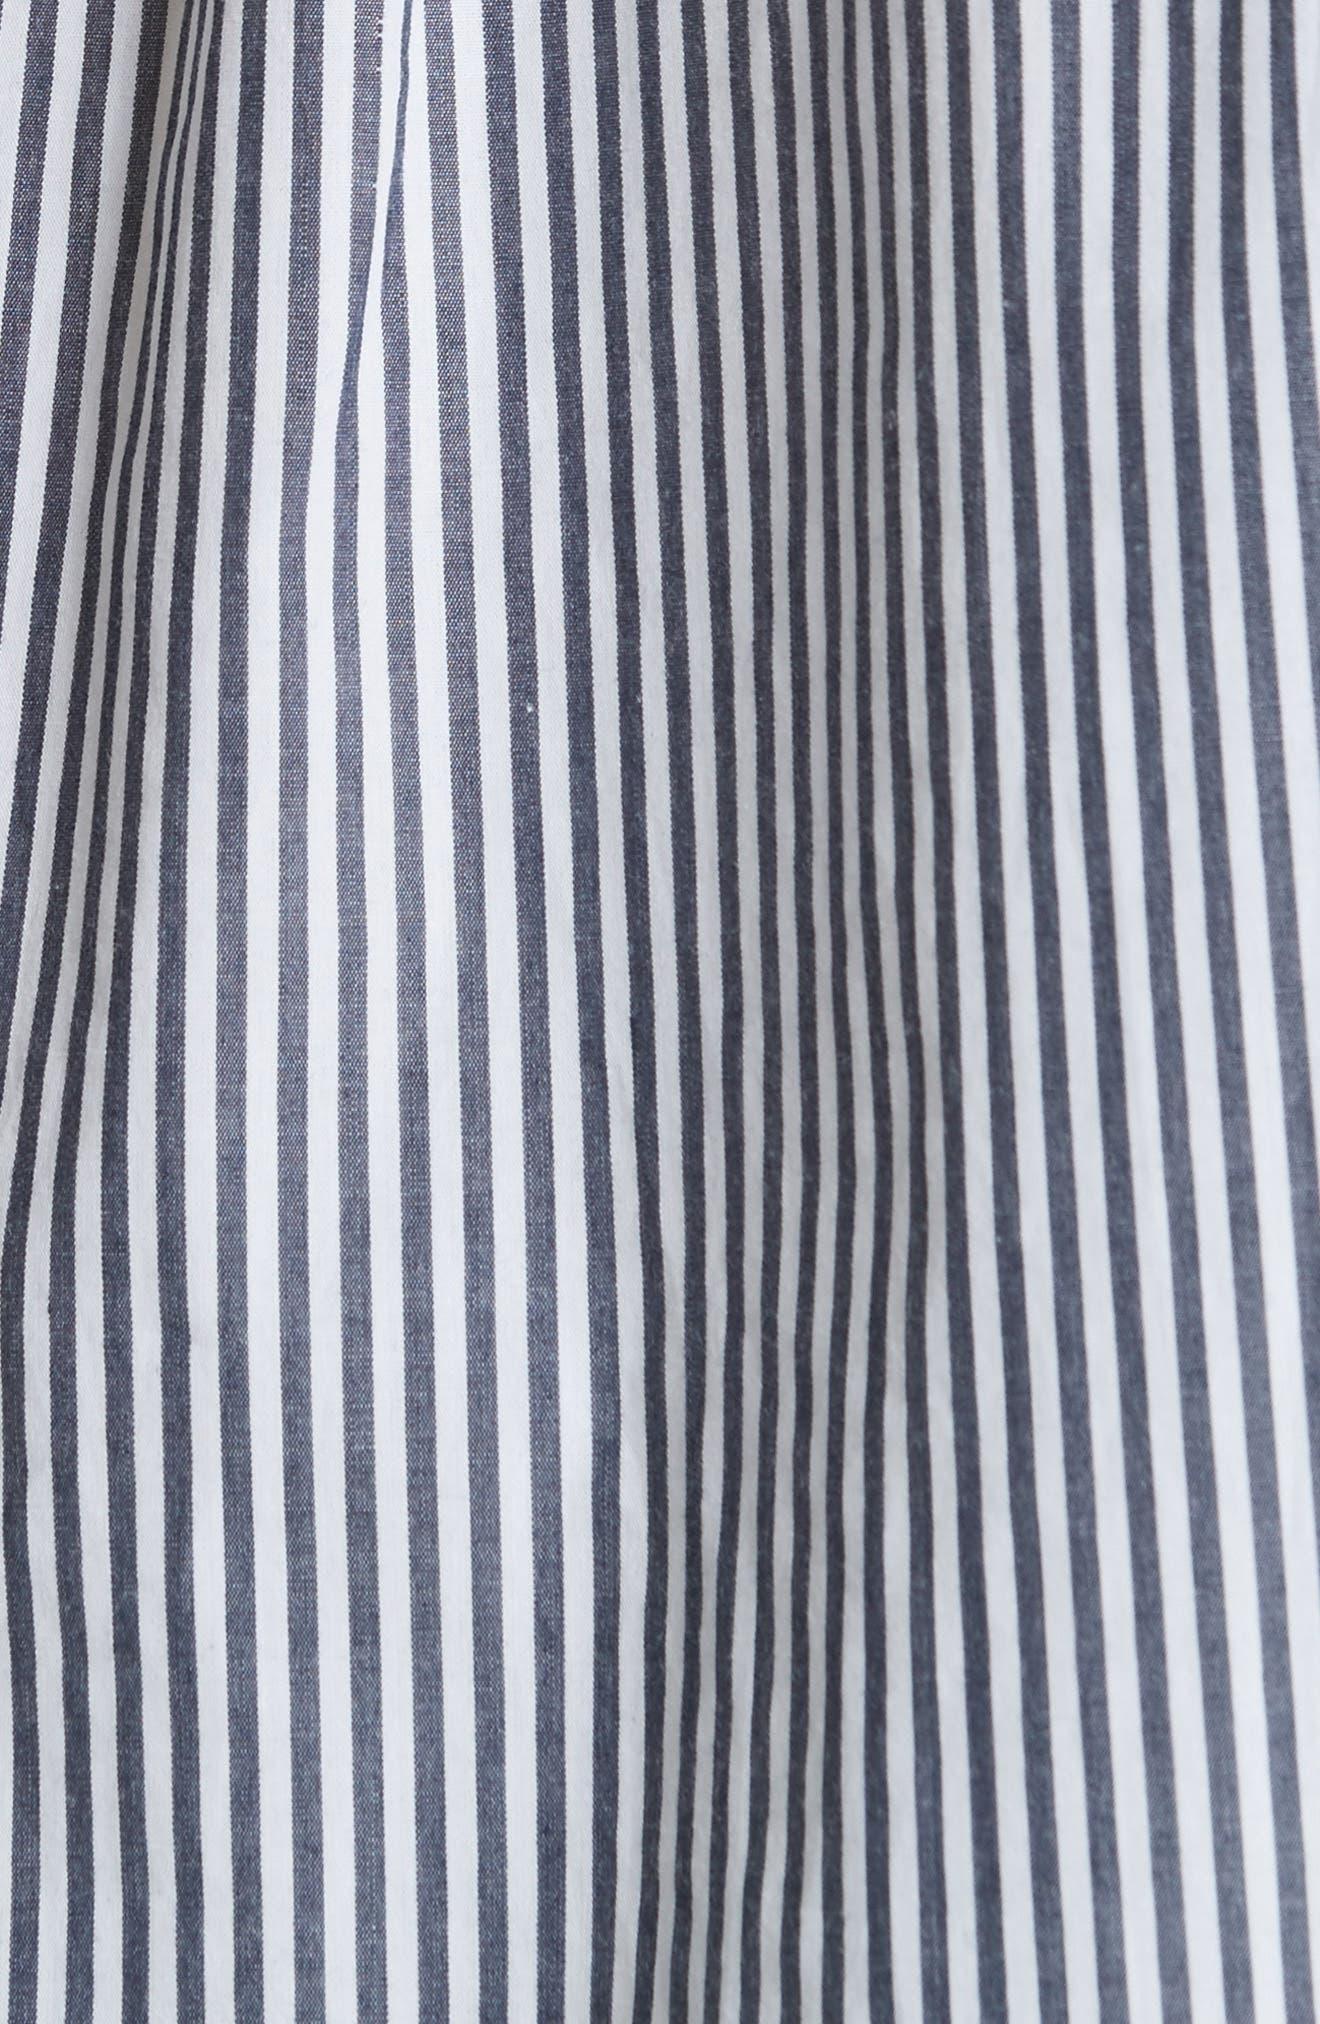 Anjanique Spread Collar Top,                             Alternate thumbnail 5, color,                             Dark Navy